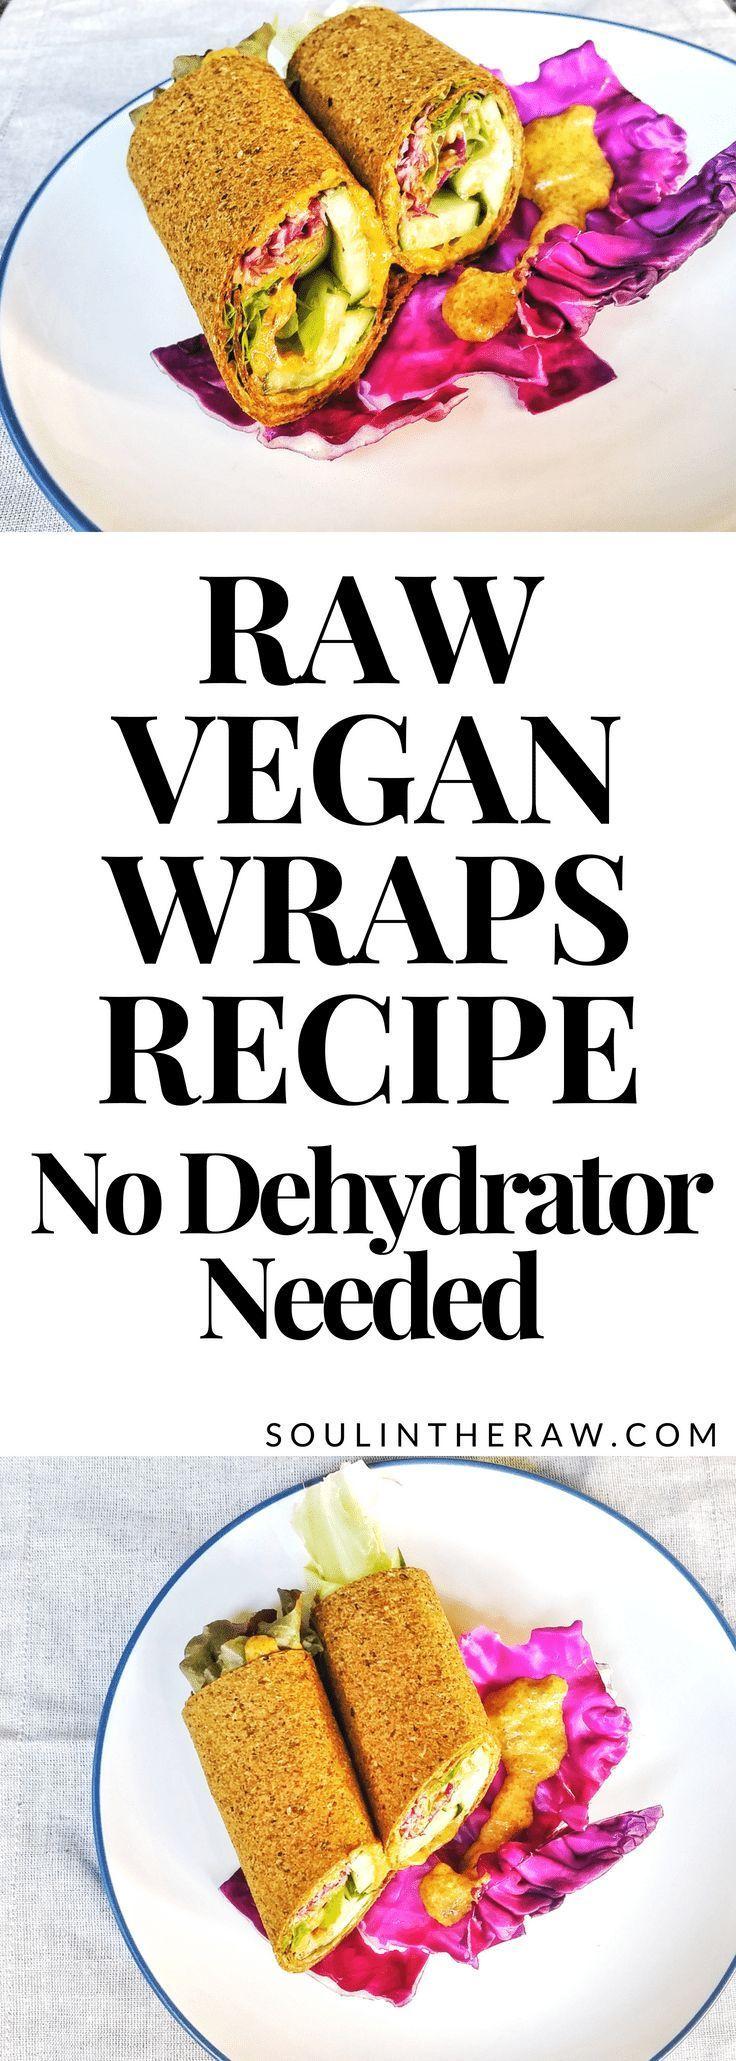 Raw Vegan Wraps Recipe No Dehydrator Needed Recipe Raw Vegan Dinners Healthy Vegan Snacks Vegan Wraps